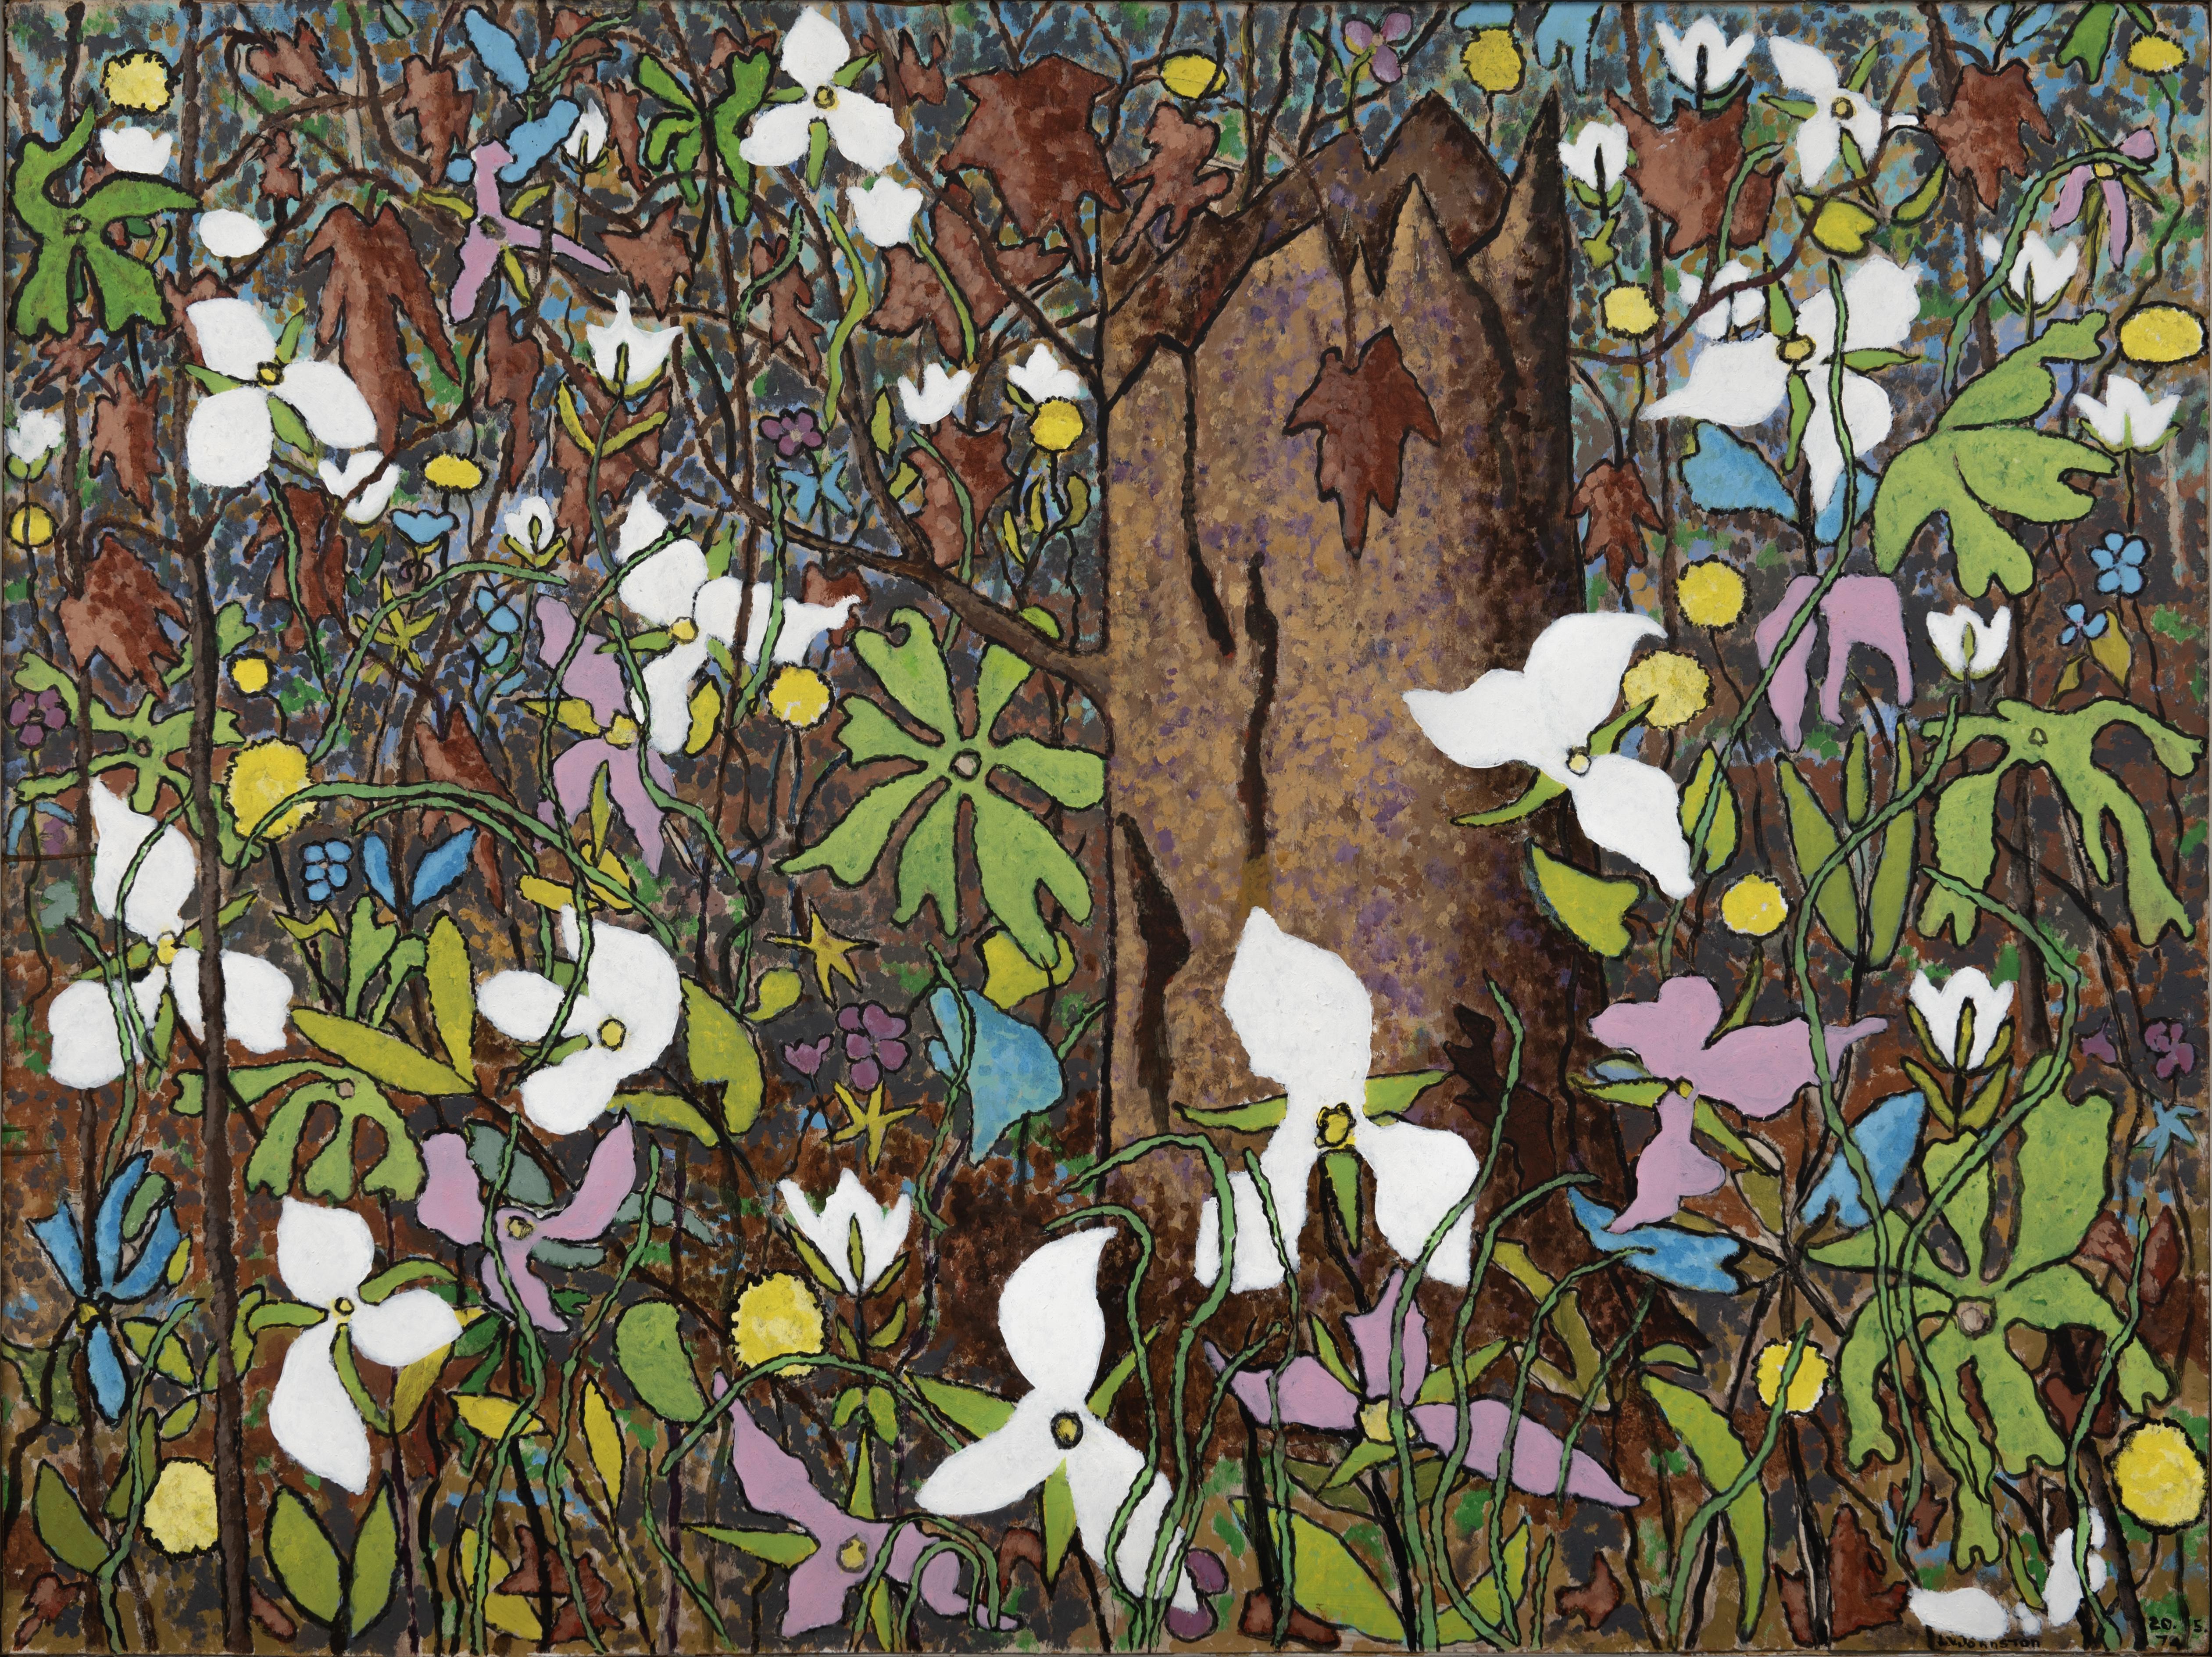 Lloyd Johnson, May Woods with Trilliums, Acrylic on masonite, 1975